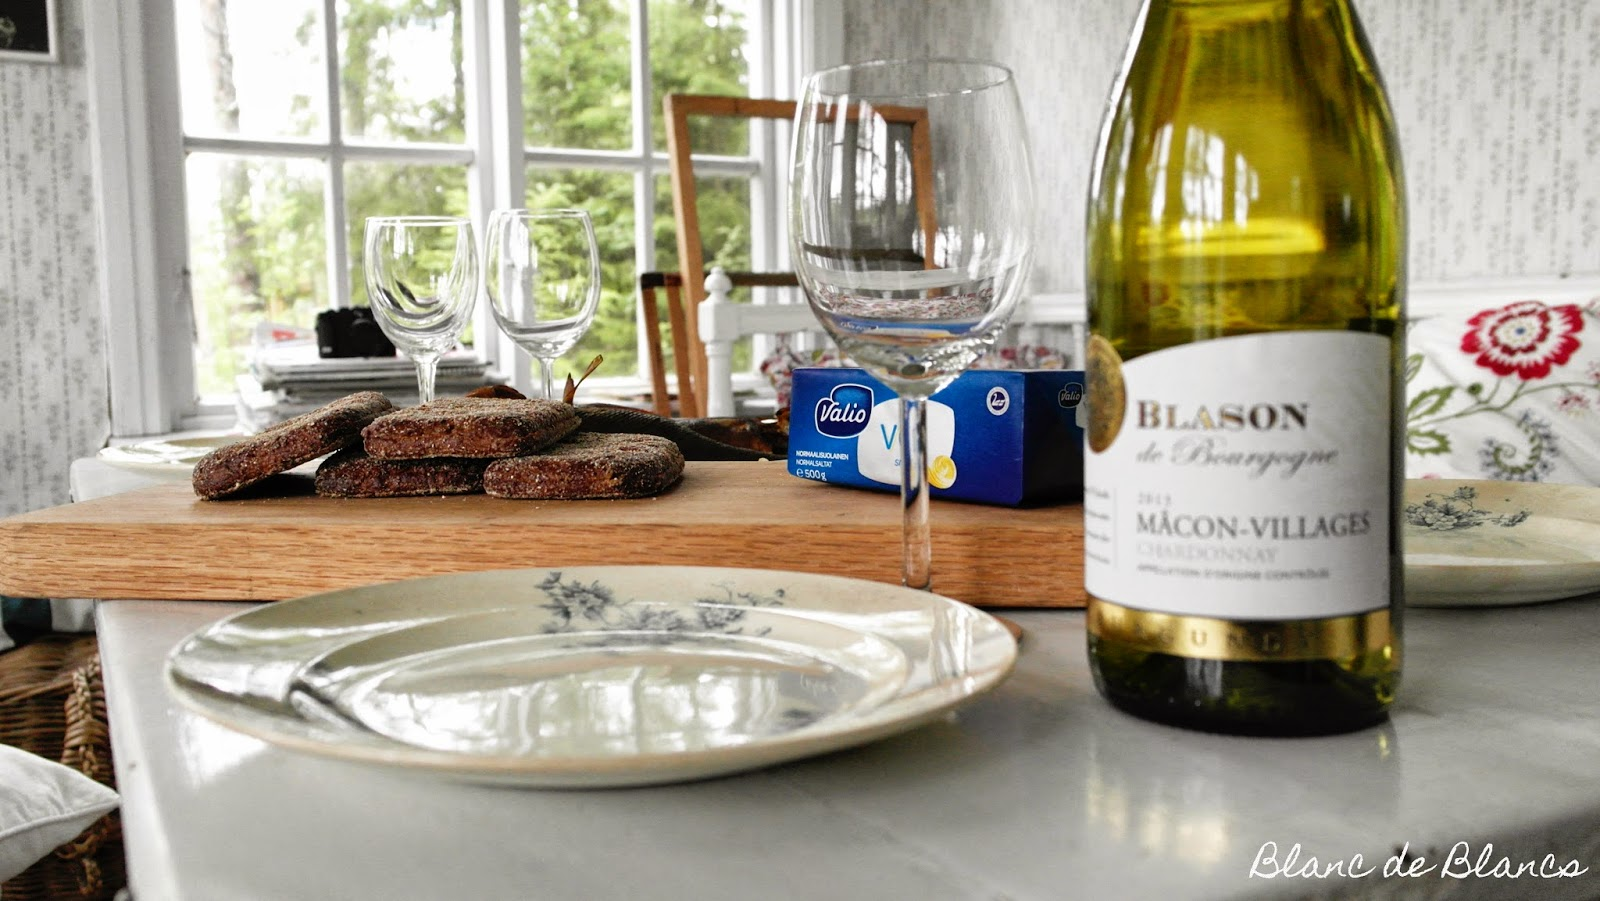 Savustettu ahven ja Blason de Bourgogne - www.blancdeblancs.fi